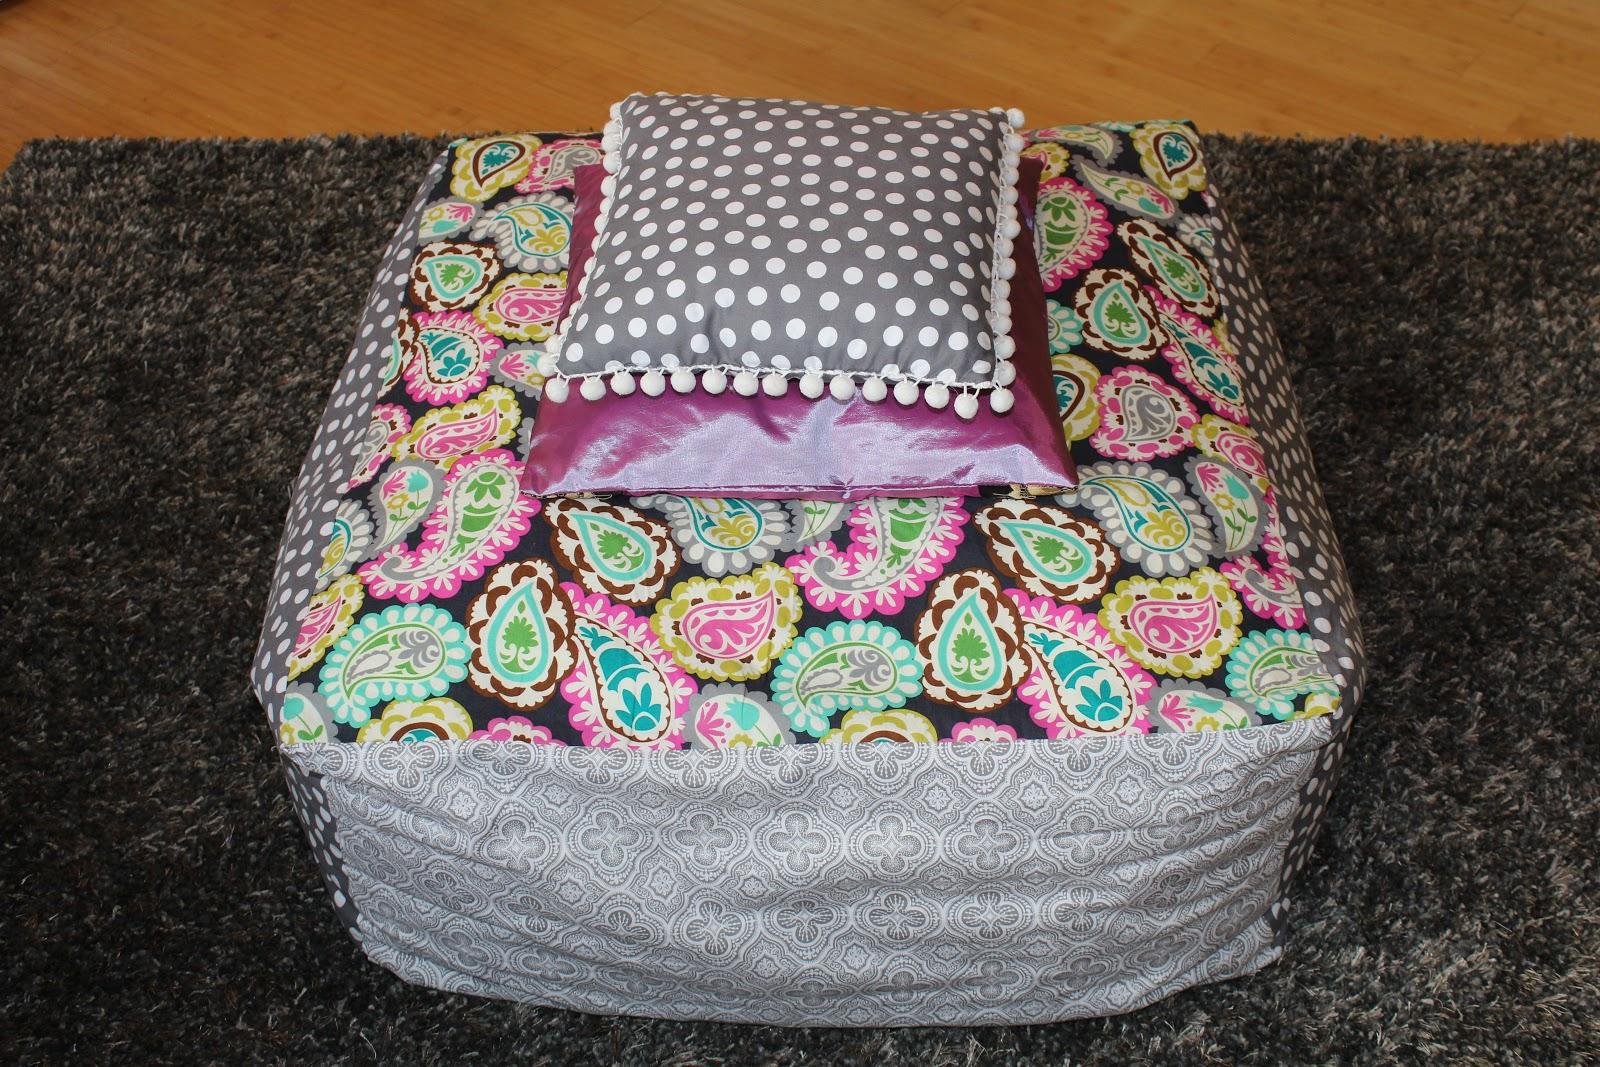 Antsi Pants Square Bean Bag Chair